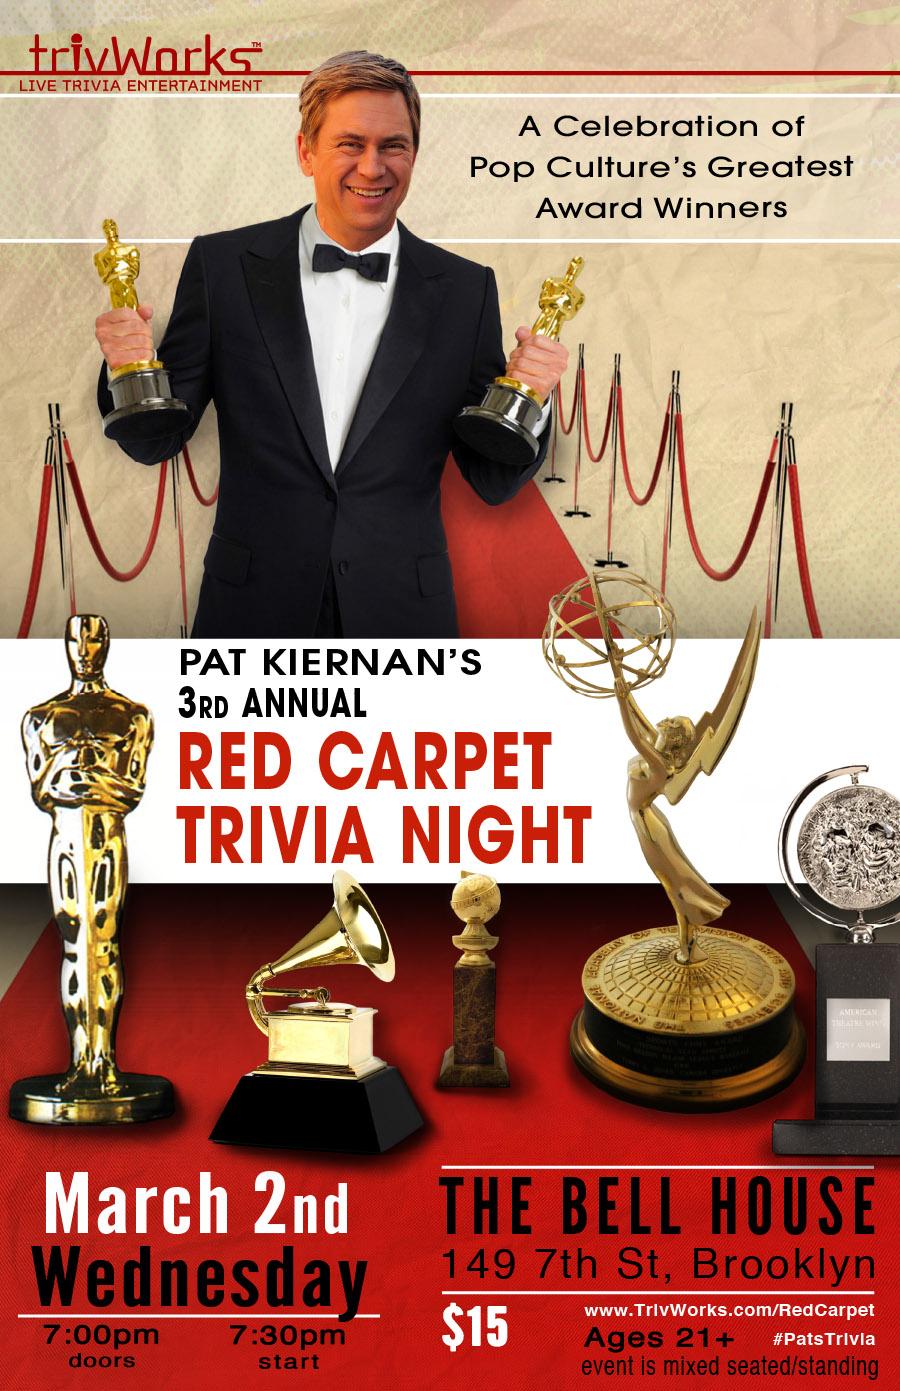 Pat.Kiernan.Red.Carpet.Trivia.Night.jpg